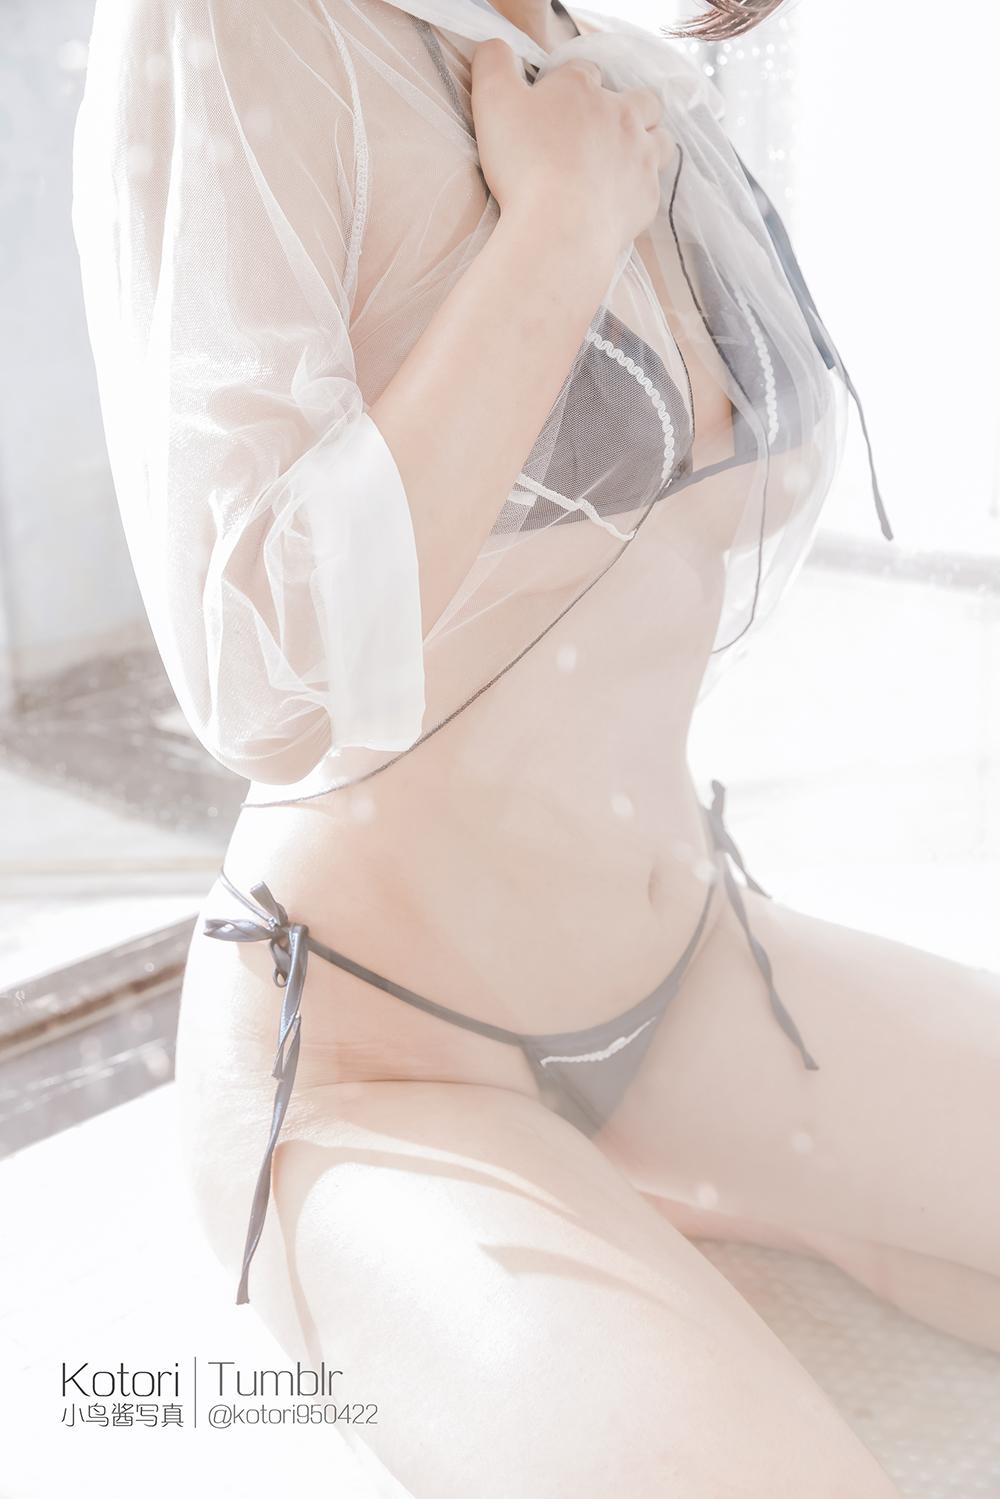 1lCP0M - Cosplay girl Tumblr PR社 福利姬 小鸟酱 透明薄纱装